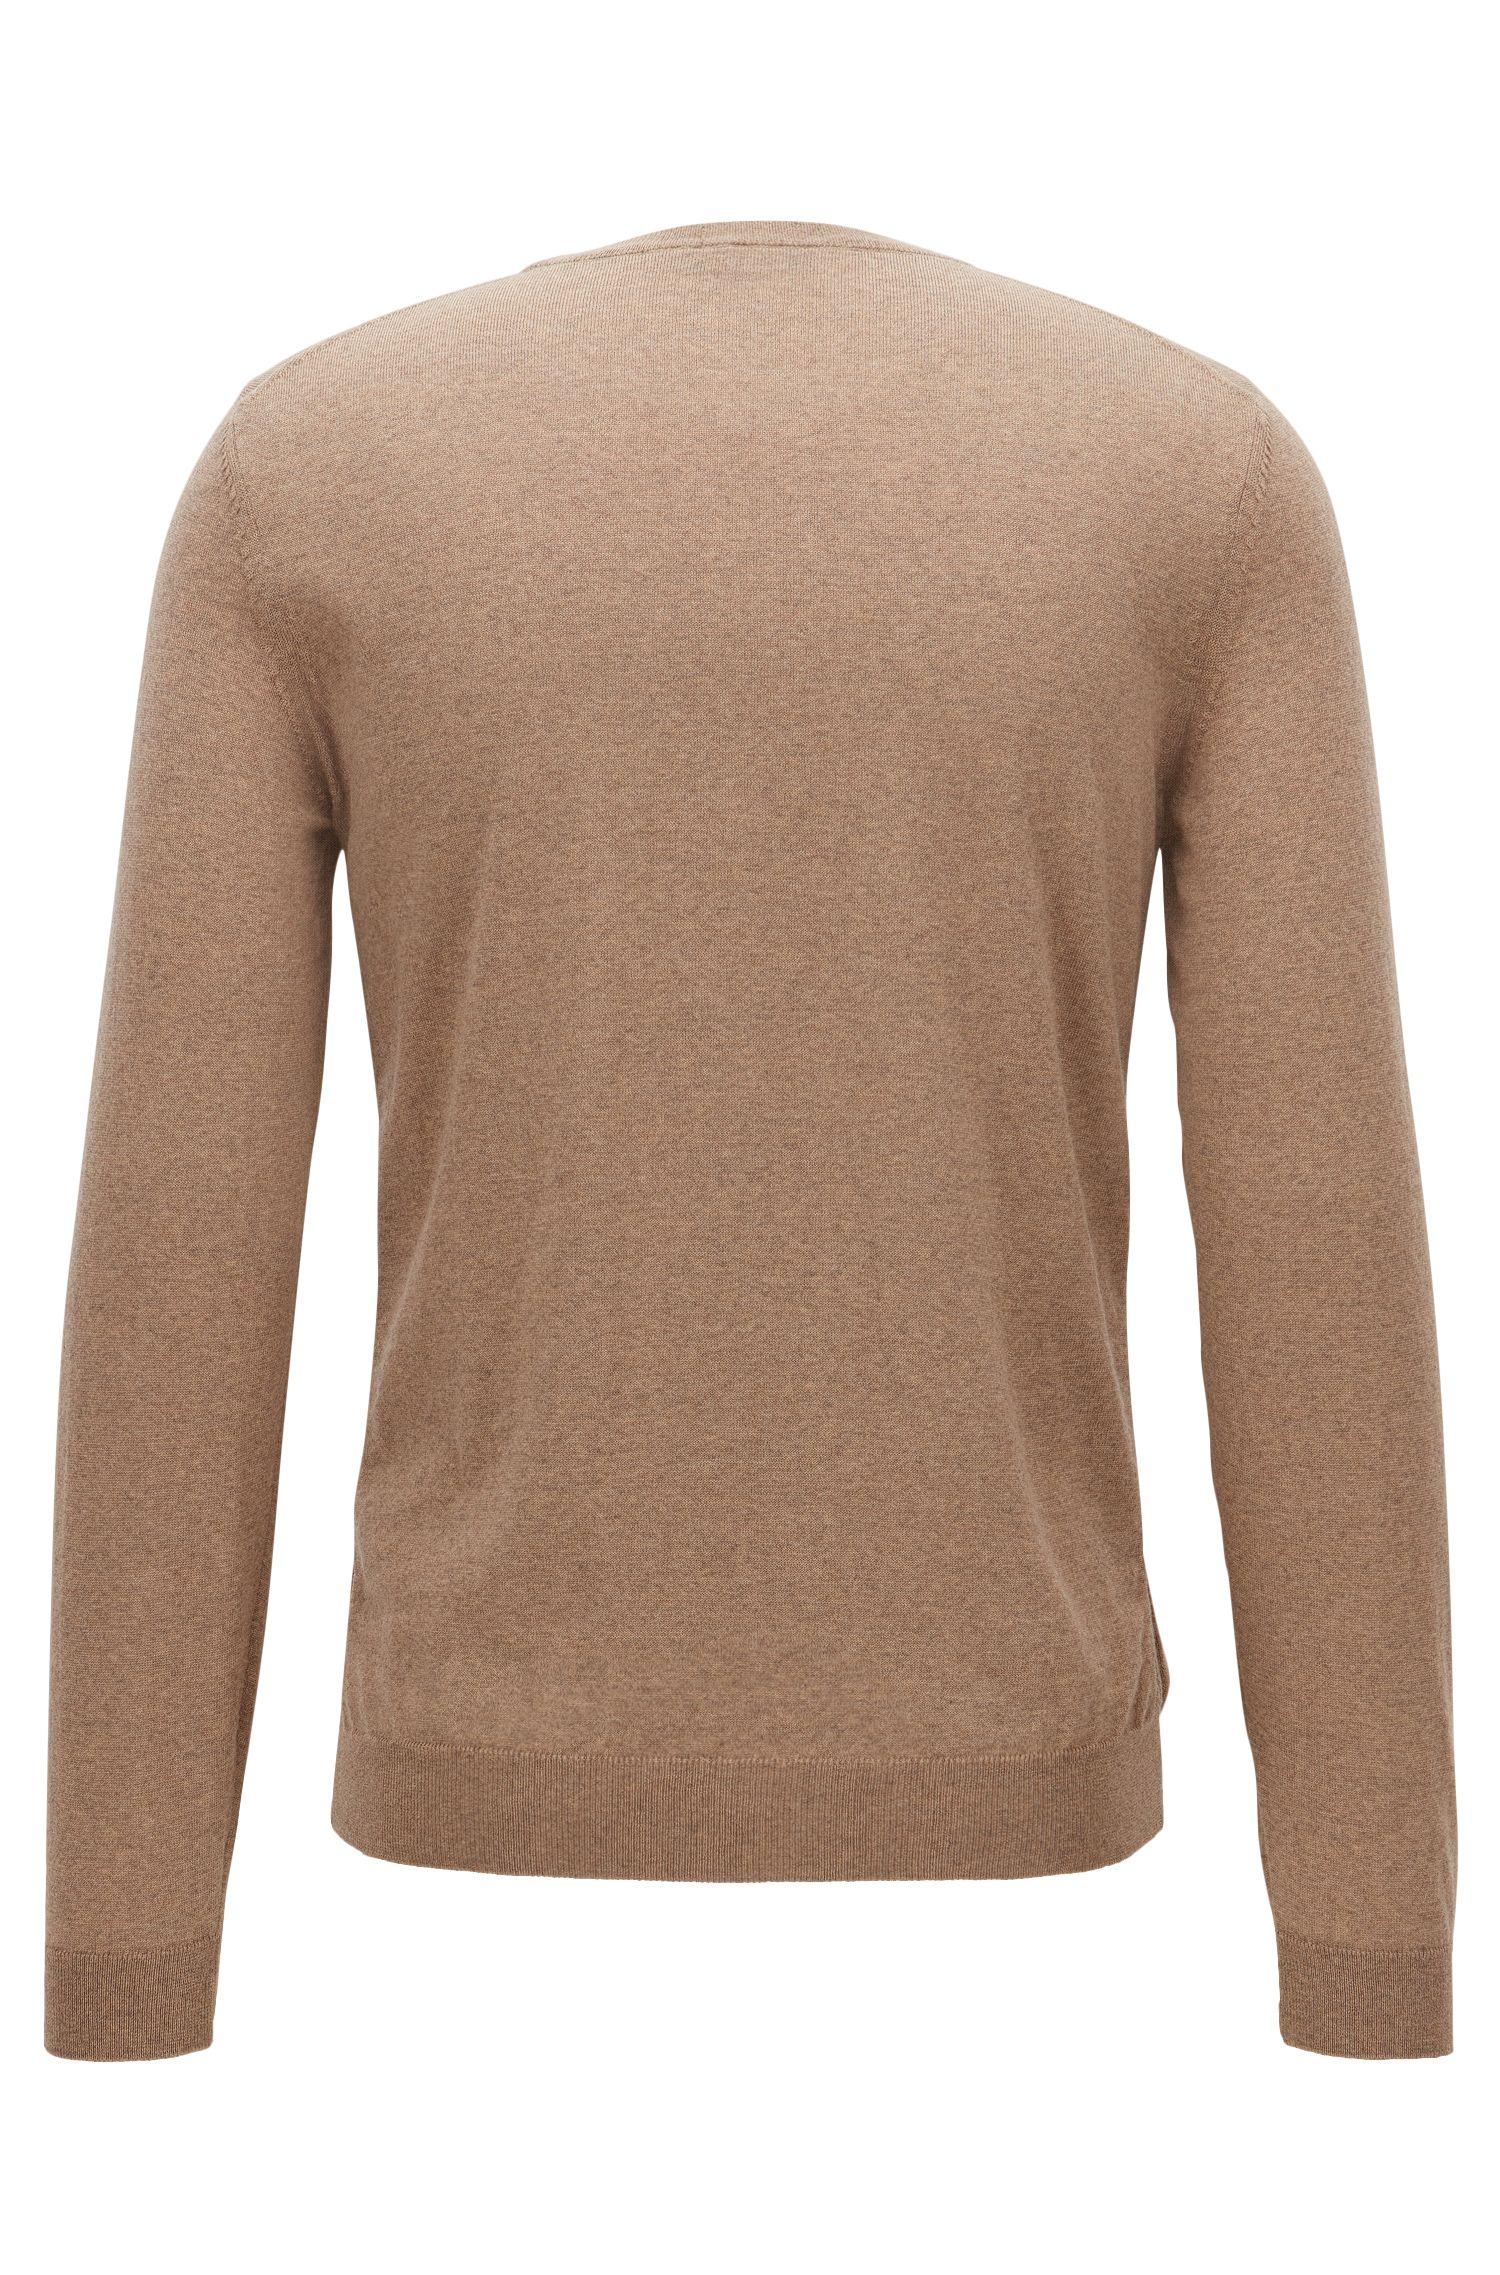 Extra-Fine Merino Wool Sweater | Leno N, Khaki